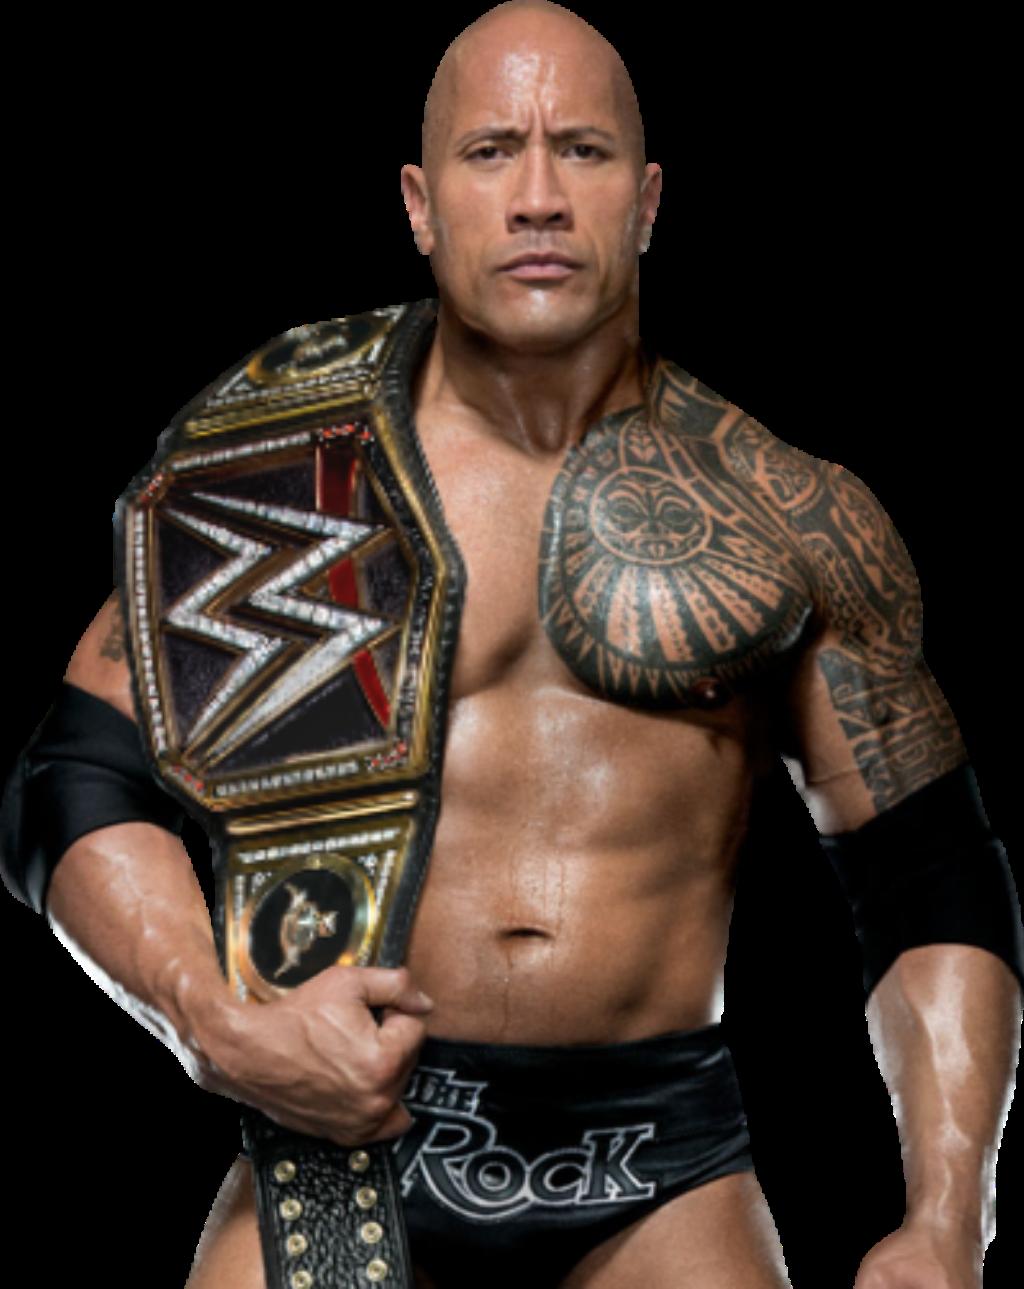 The Rock WWE Champion 2017 by NuruddinAyobWWE on DeviantArt